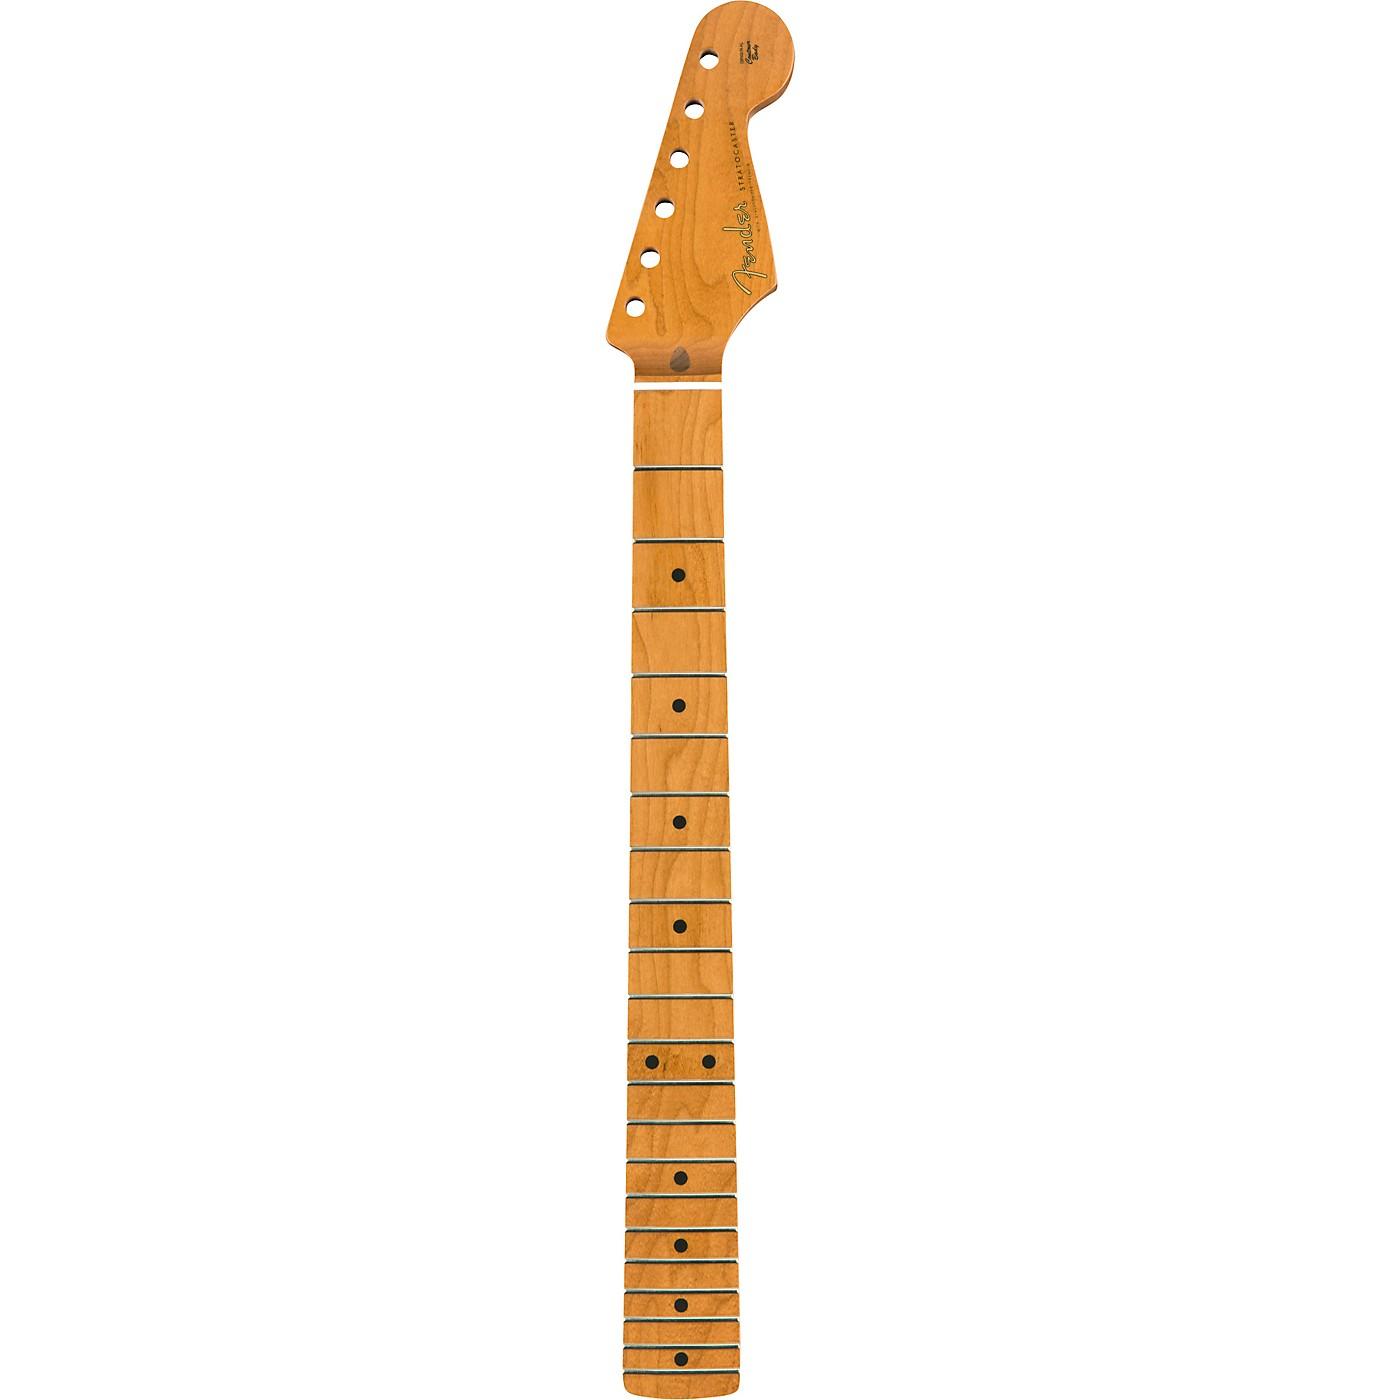 Fender Vintera Mod '50s Stratocaster Neck thumbnail